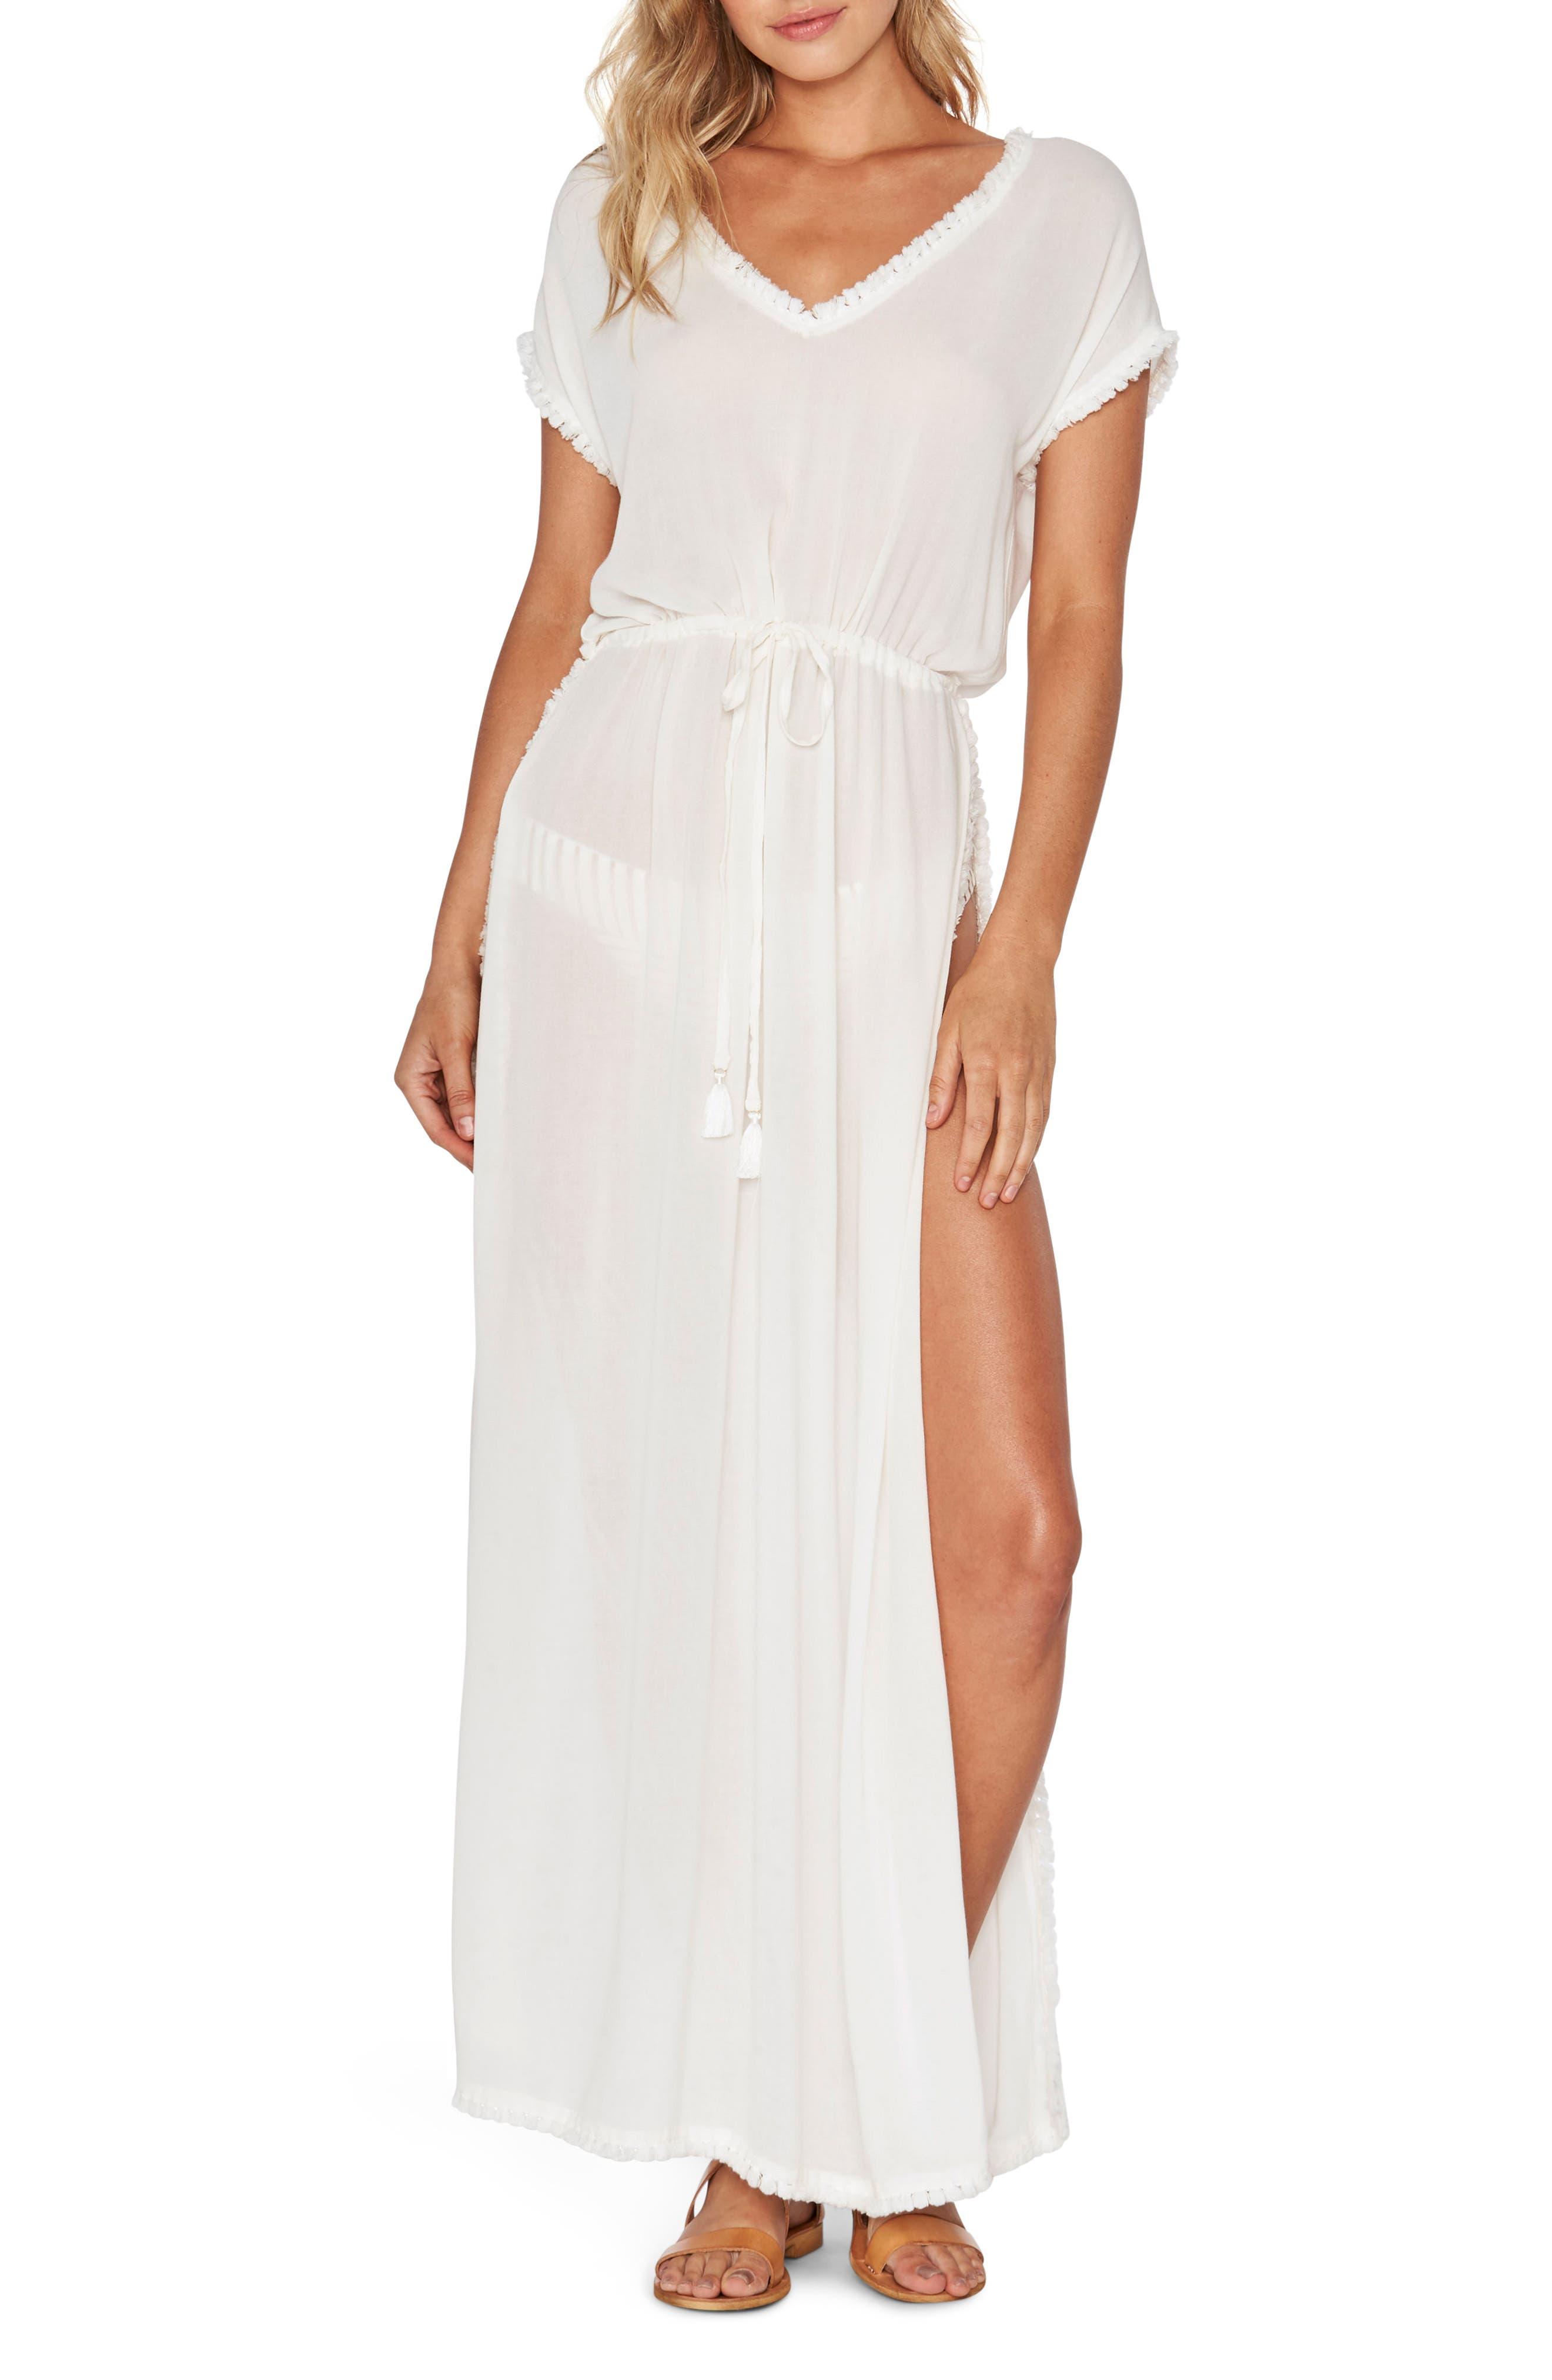 Noveau Cover-Up Maxi Dress,                             Main thumbnail 1, color,                             100